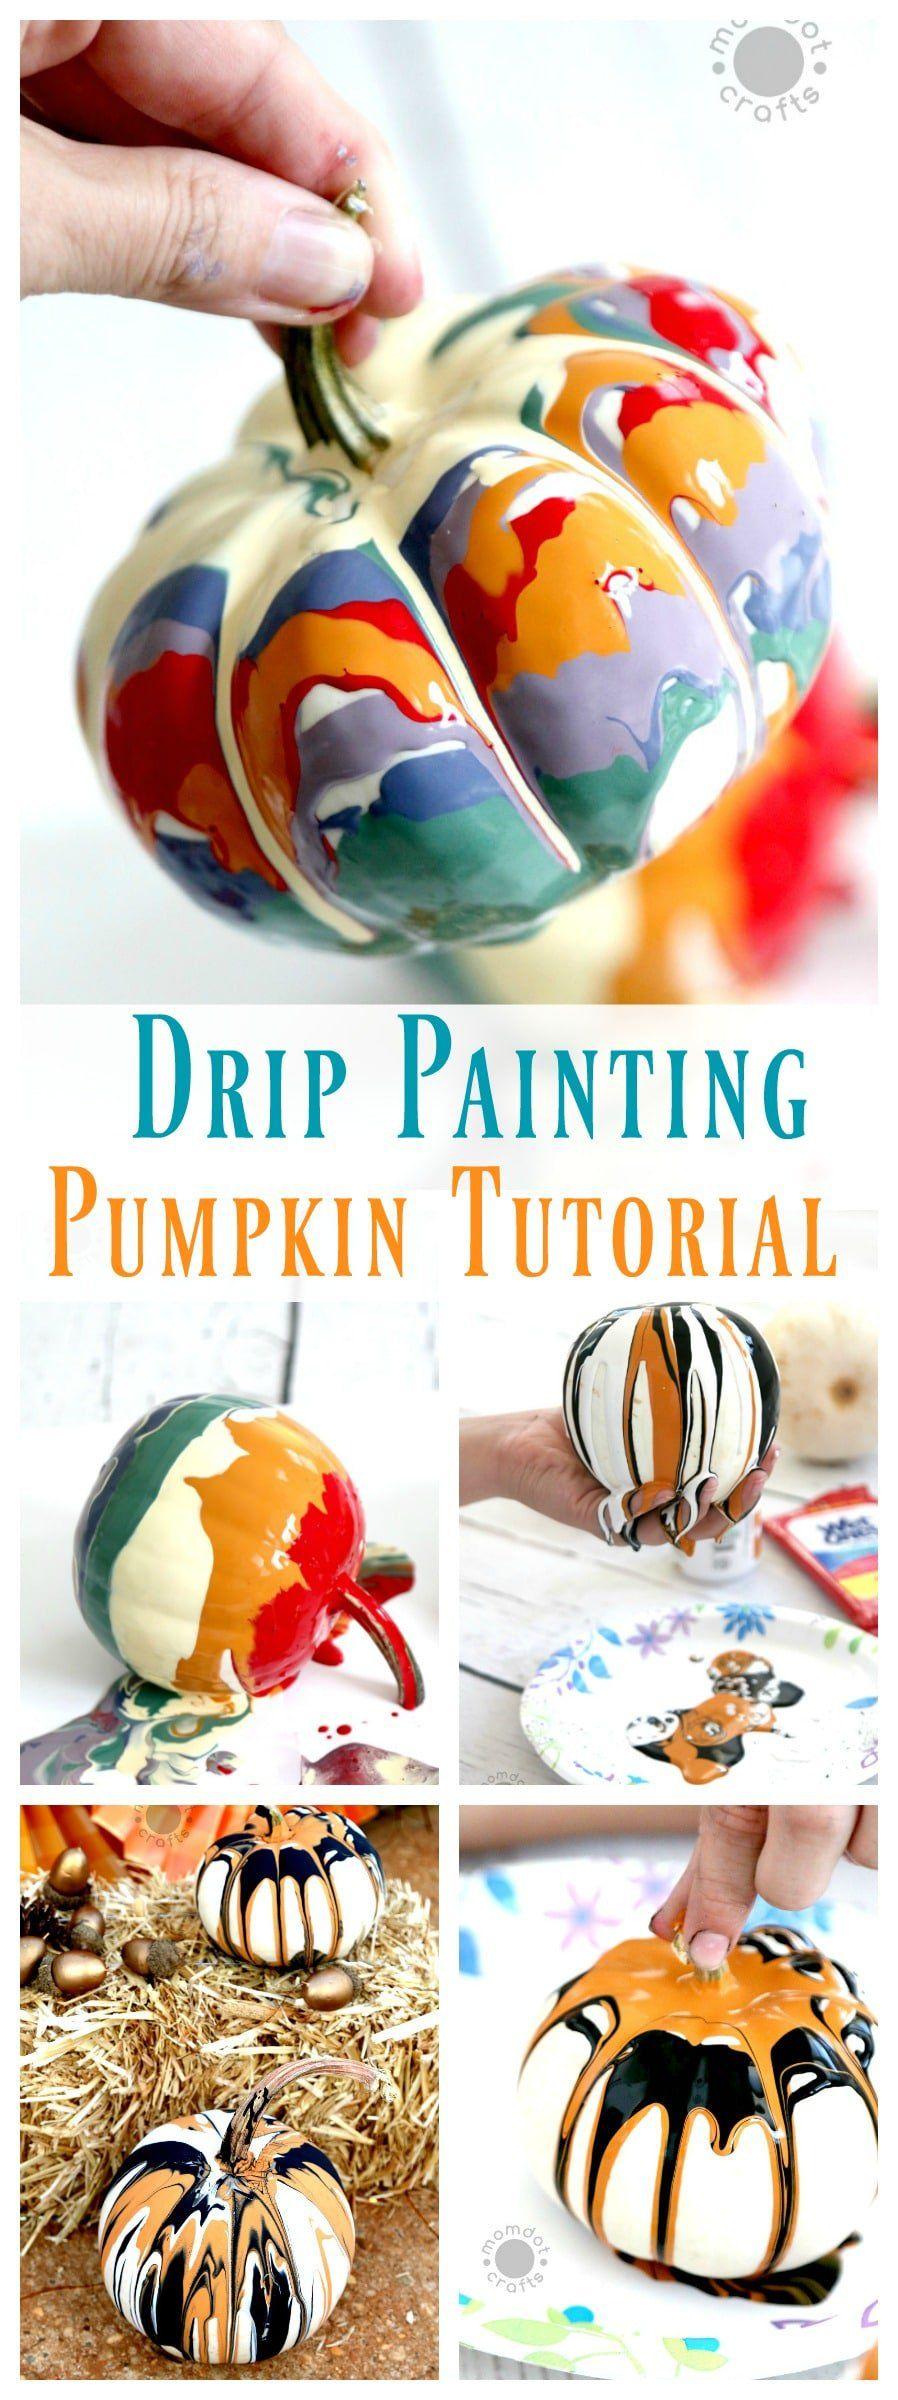 10 Diy Halloween Painted Pumpkin Ideas #paintedpumpkinideas